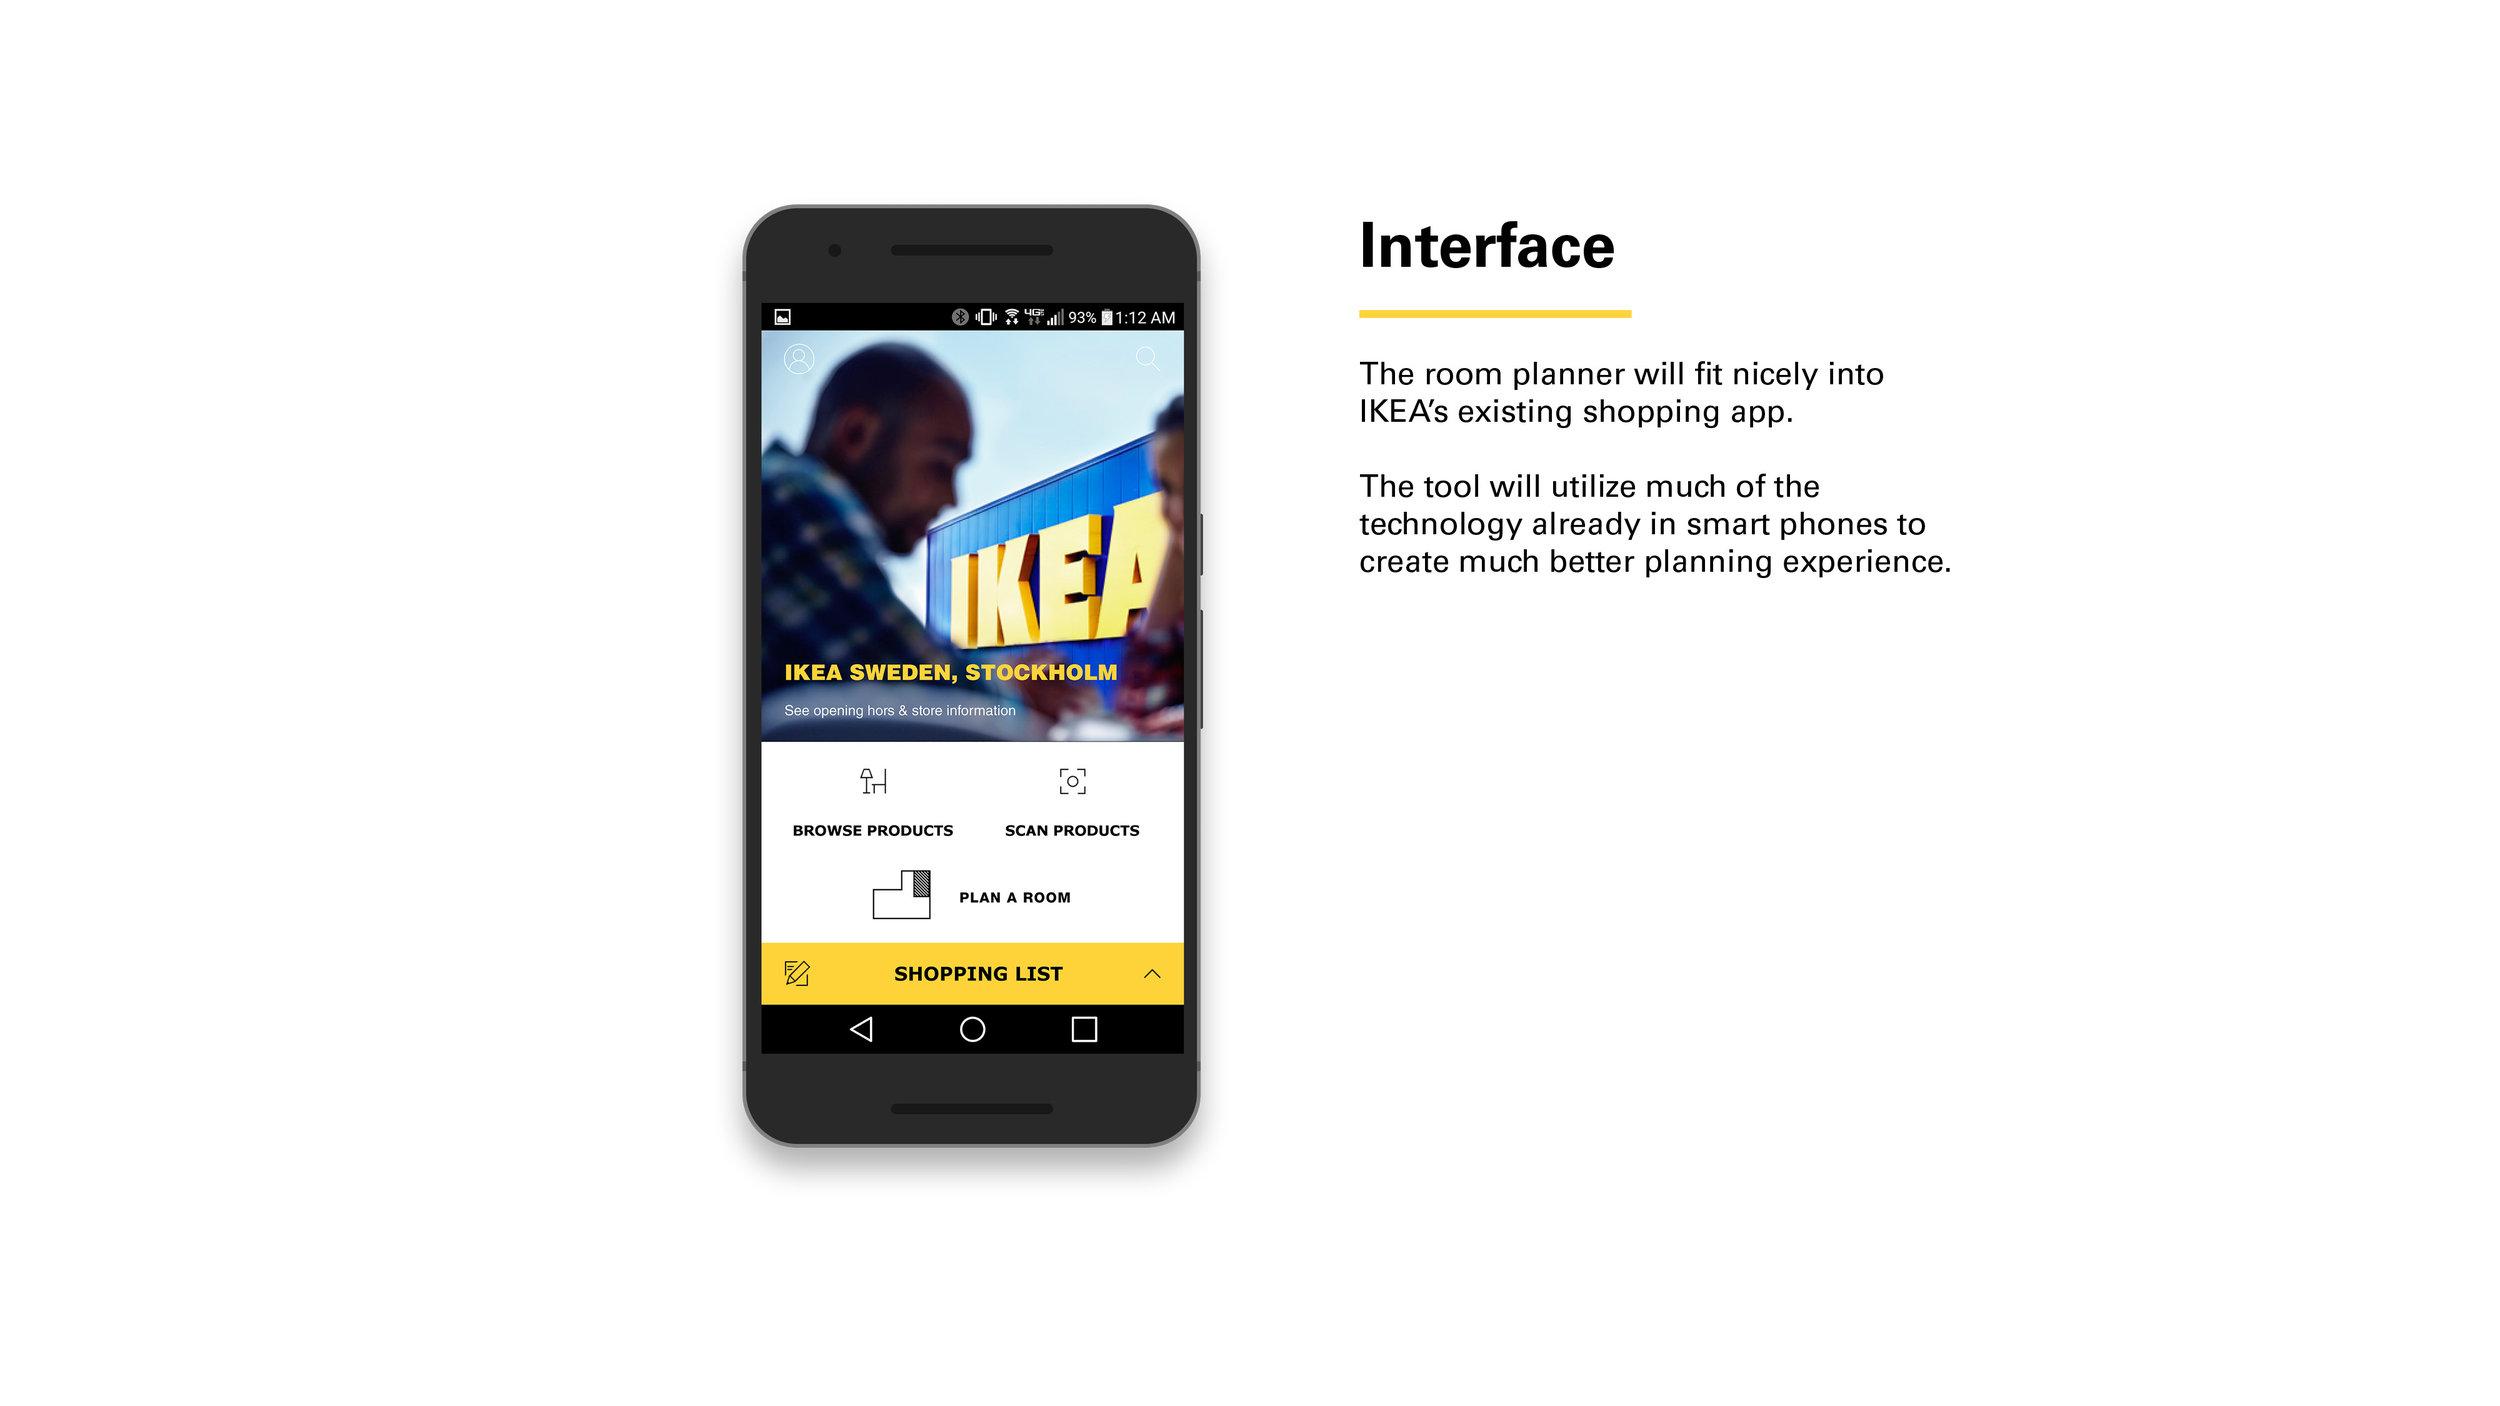 IKEA_AR_Planner_ProcessBook11.jpg